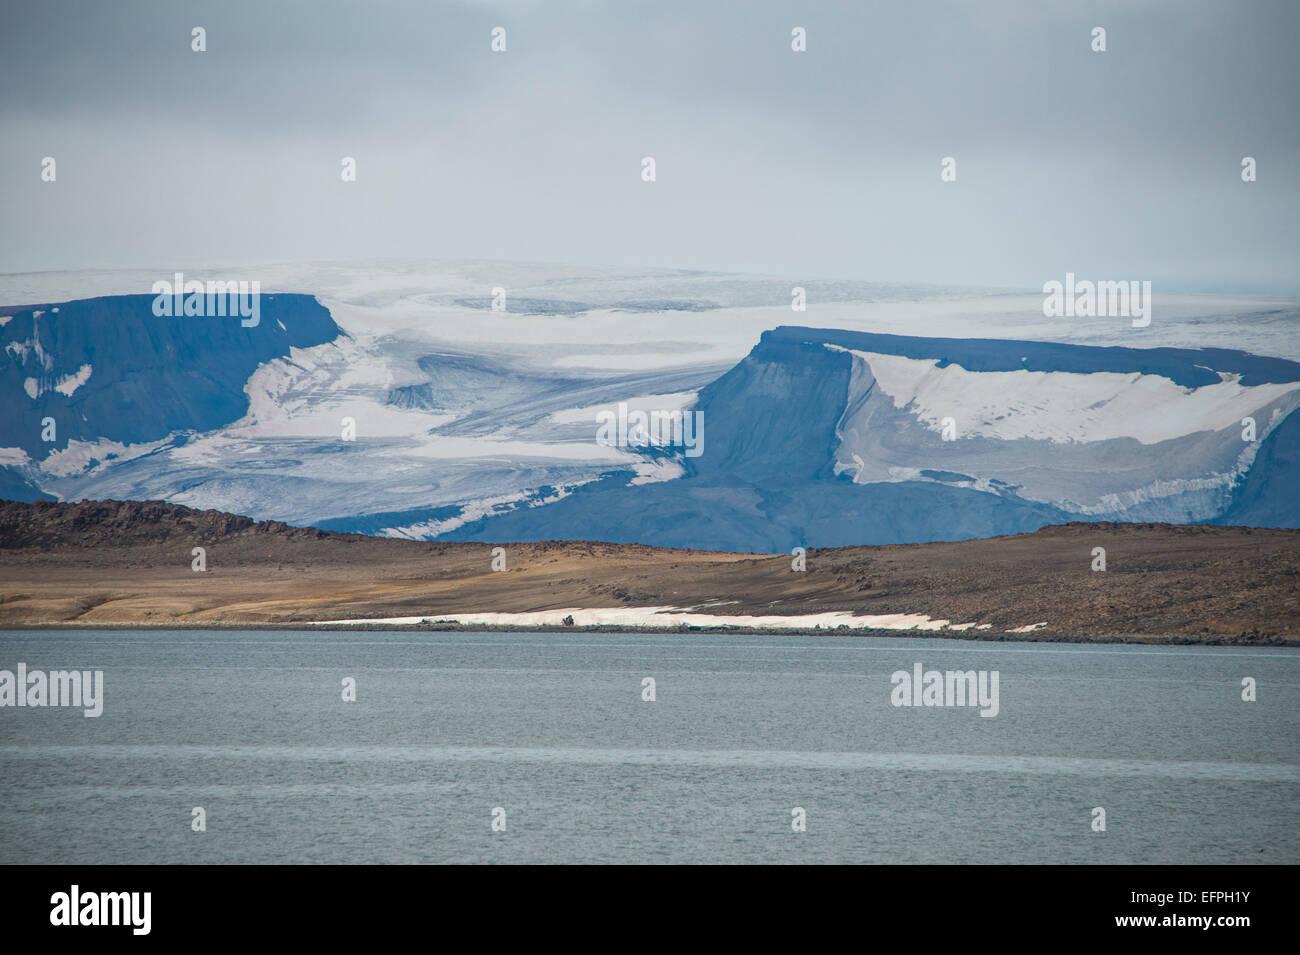 Huge glacier in Bjornsund, Svalbard, Arctic - Stock Image